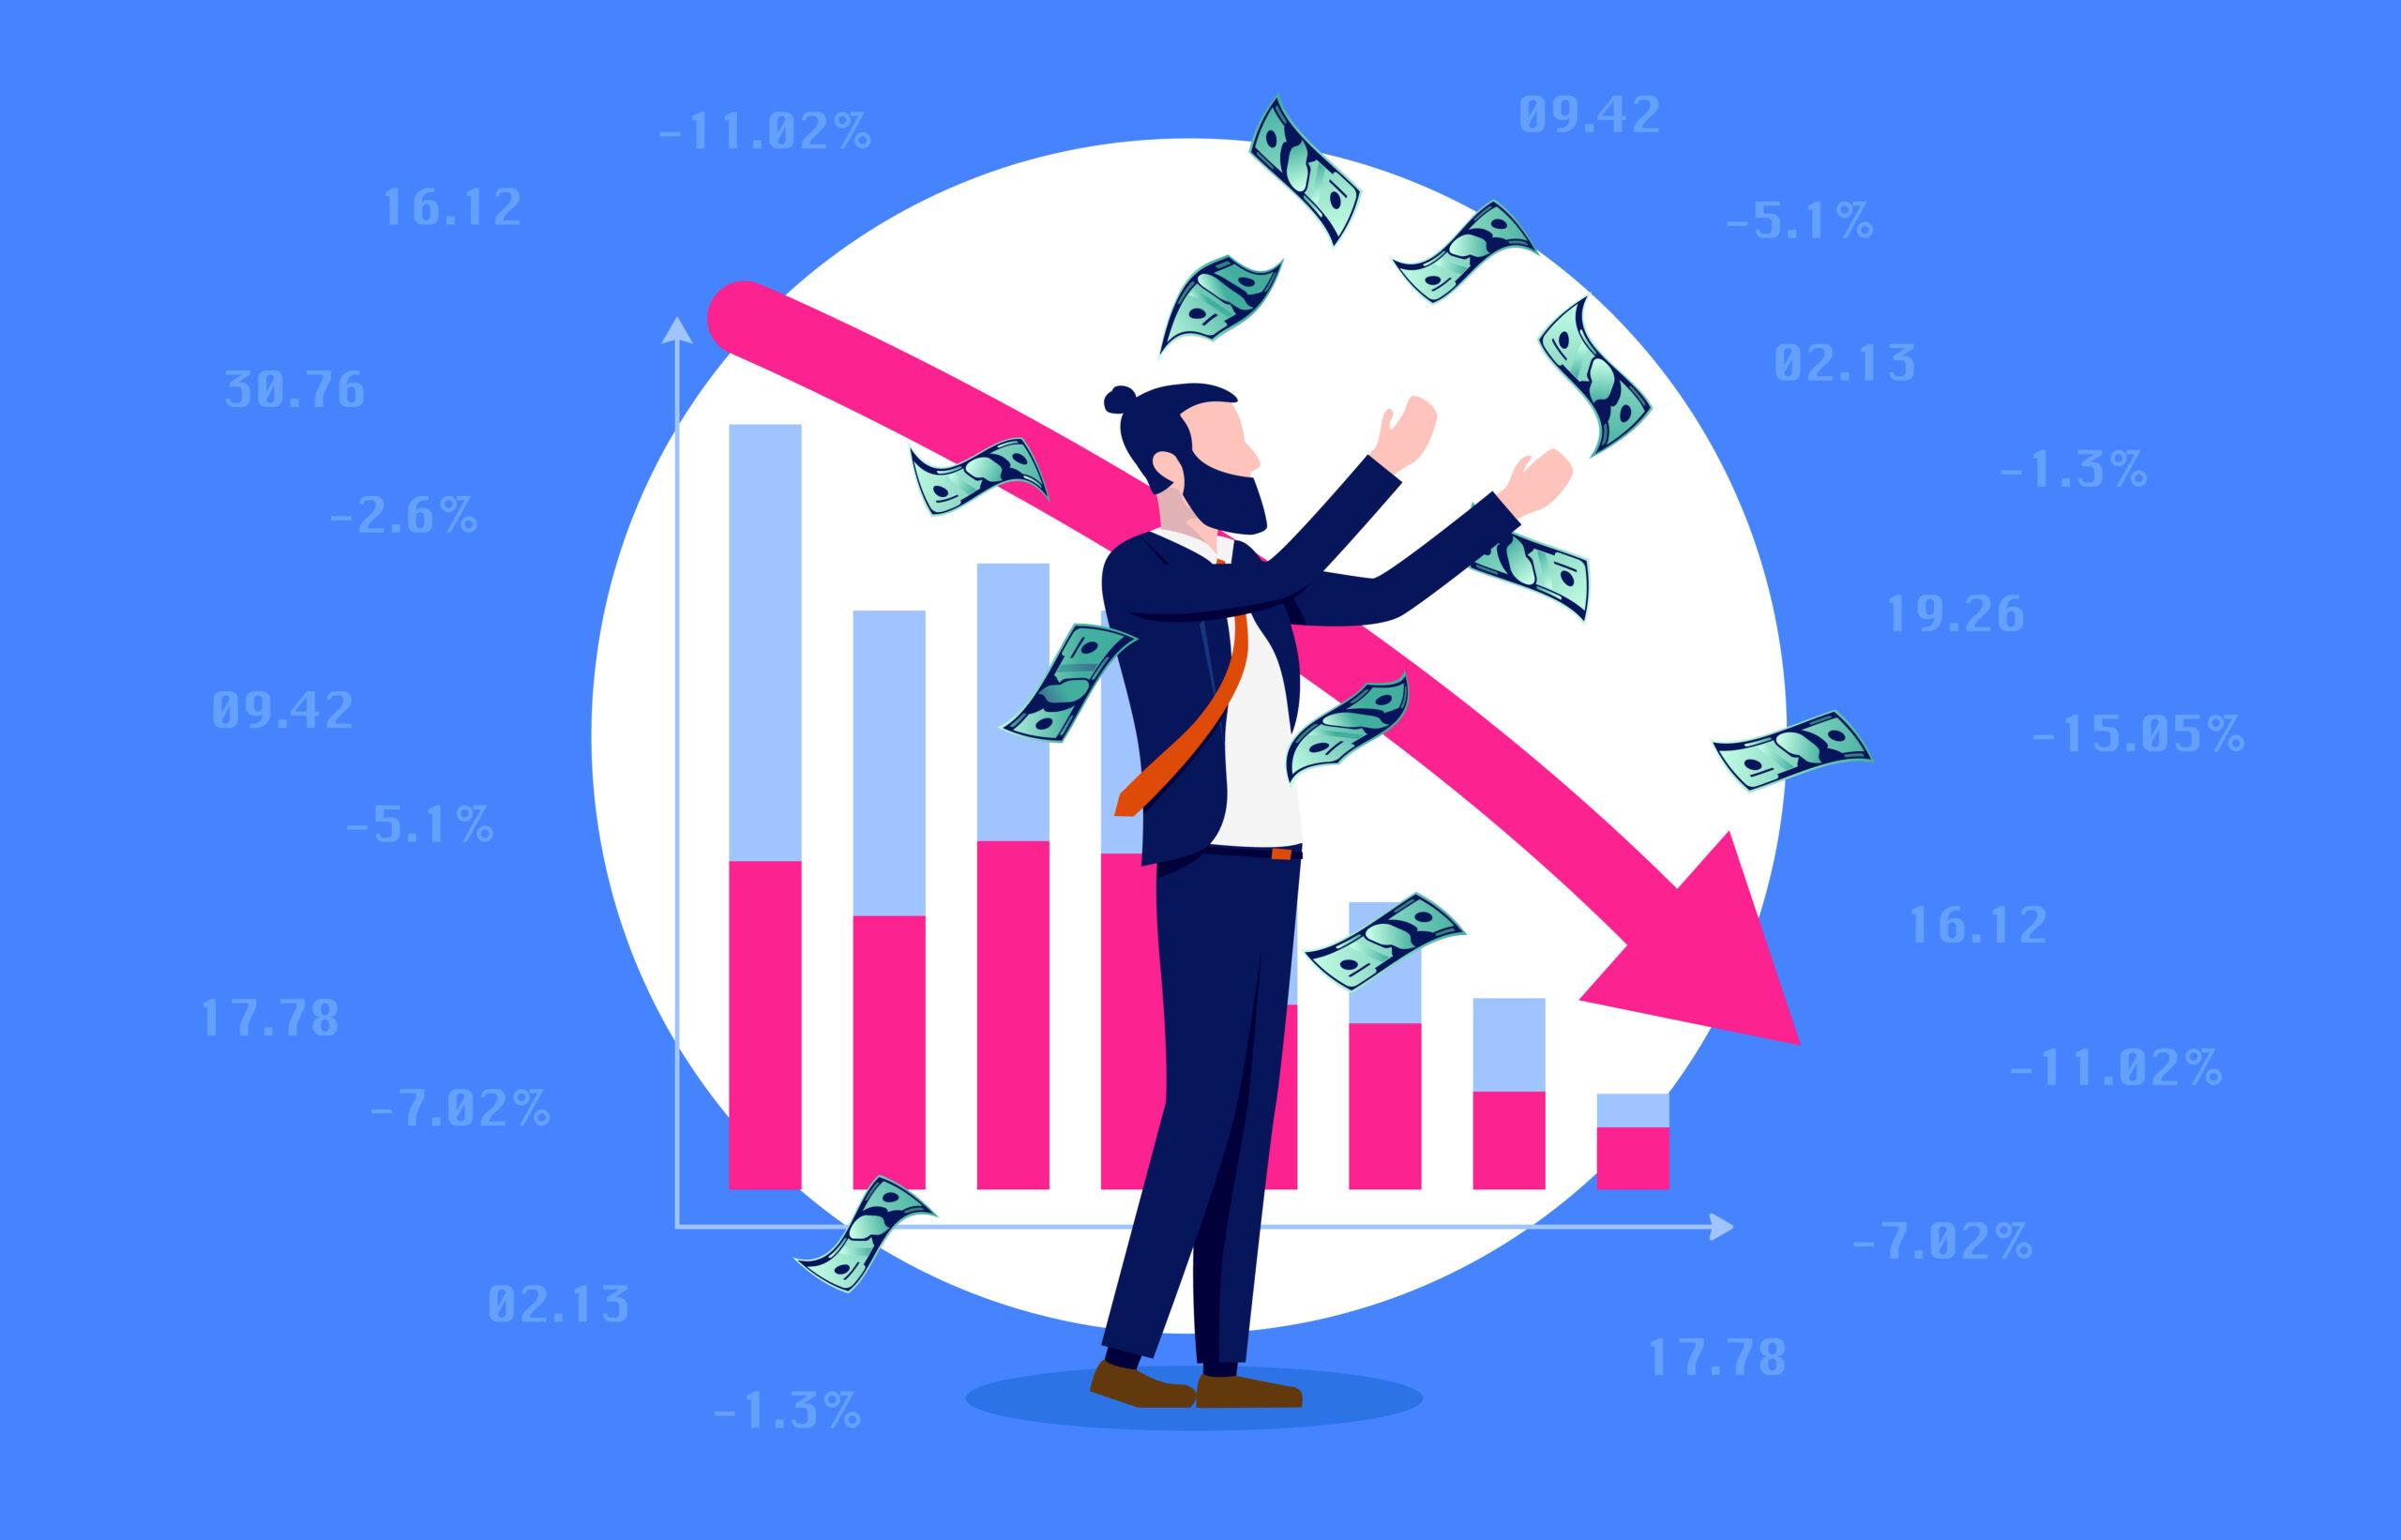 Man making money by short selling stocks